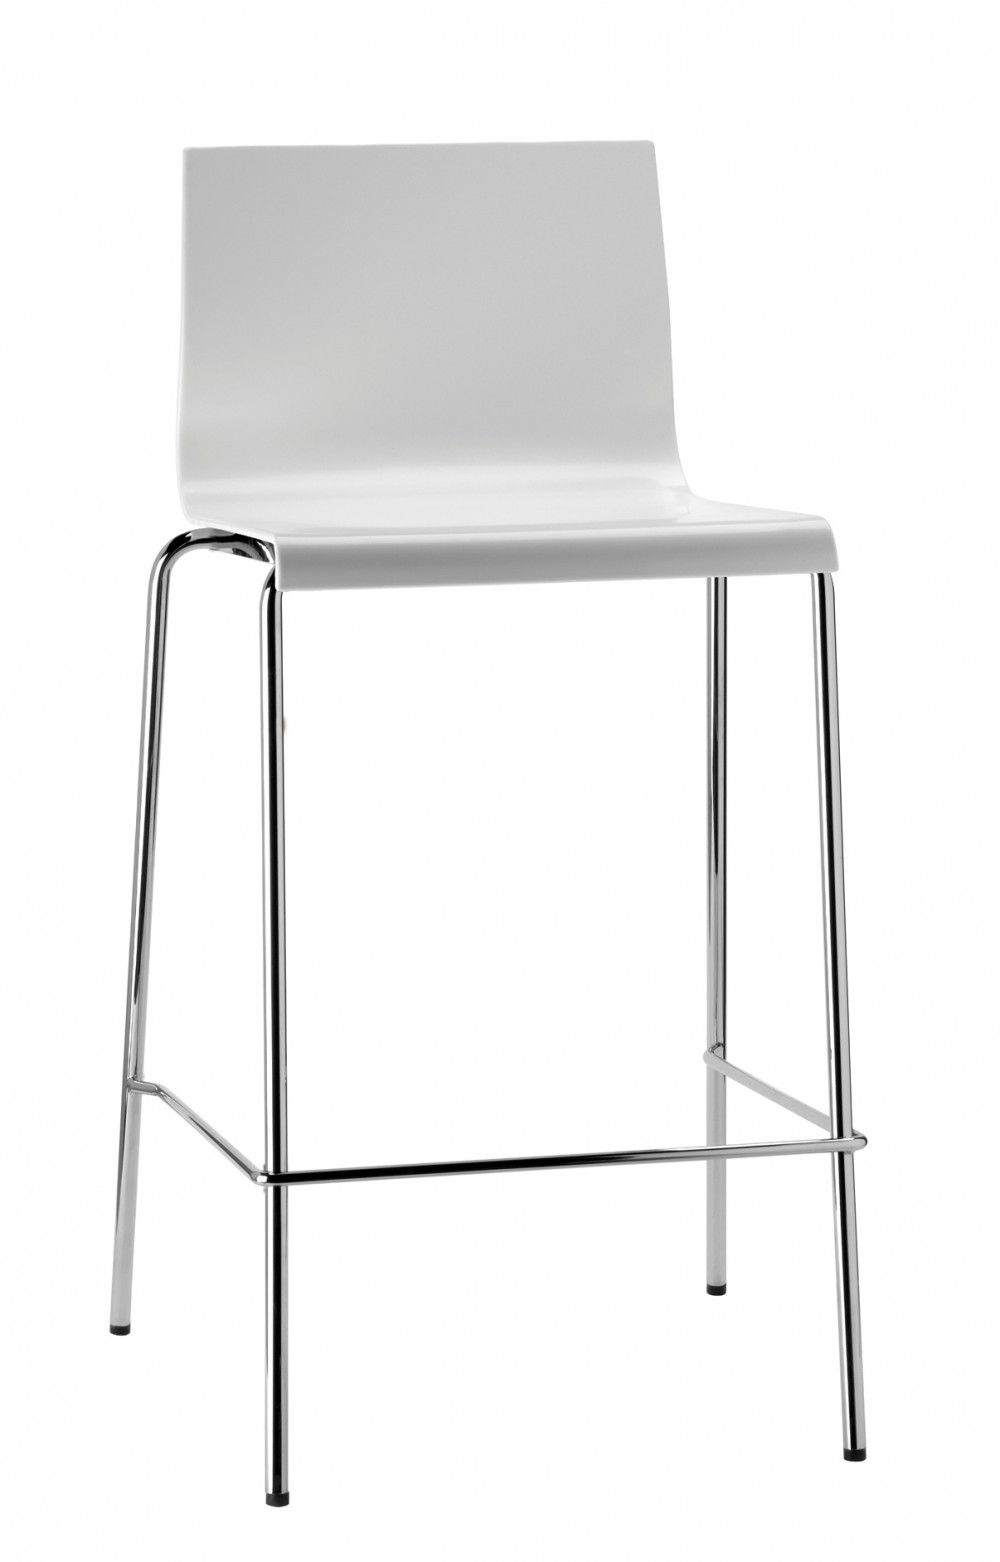 Design barhocker wei barstuhl wei chrome sitzh he 67 for Bar und barhocker